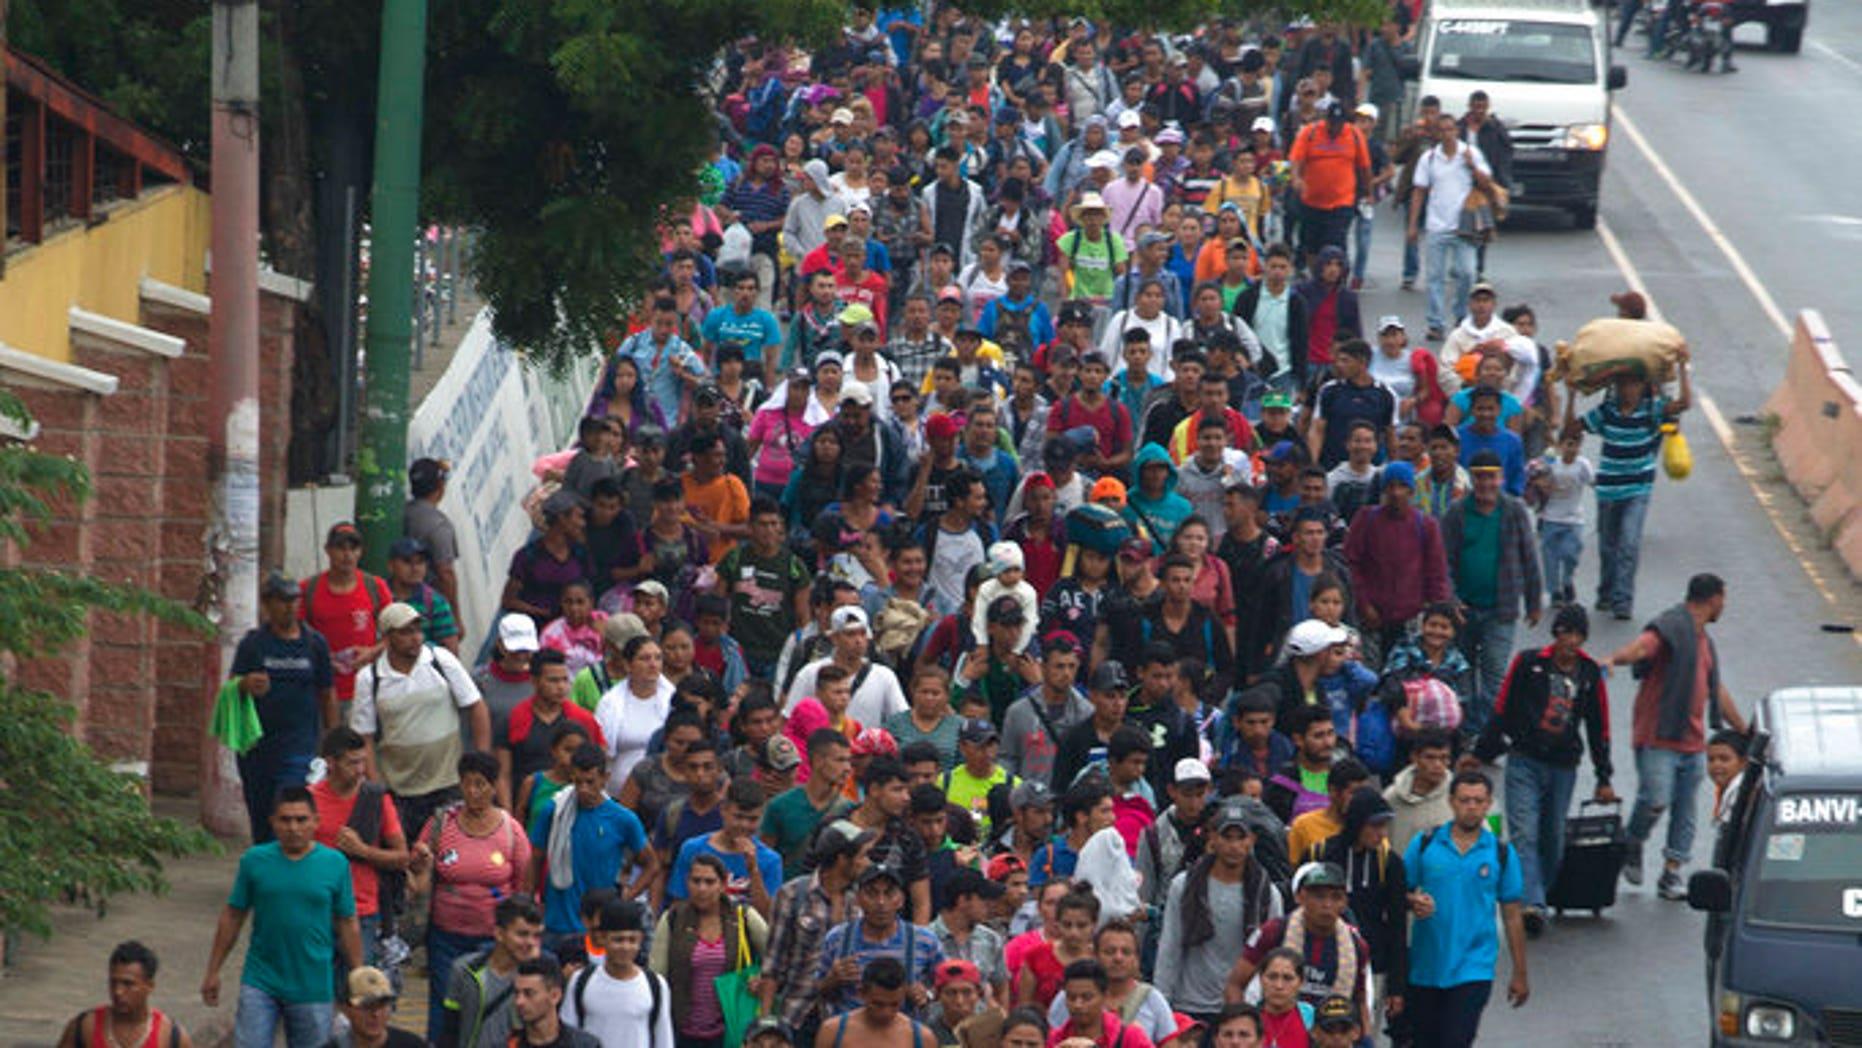 Honduran migrants walking to the U.S. start their day departing Chiquimula, Guatemala. (AP Photo/Moises Castillo)